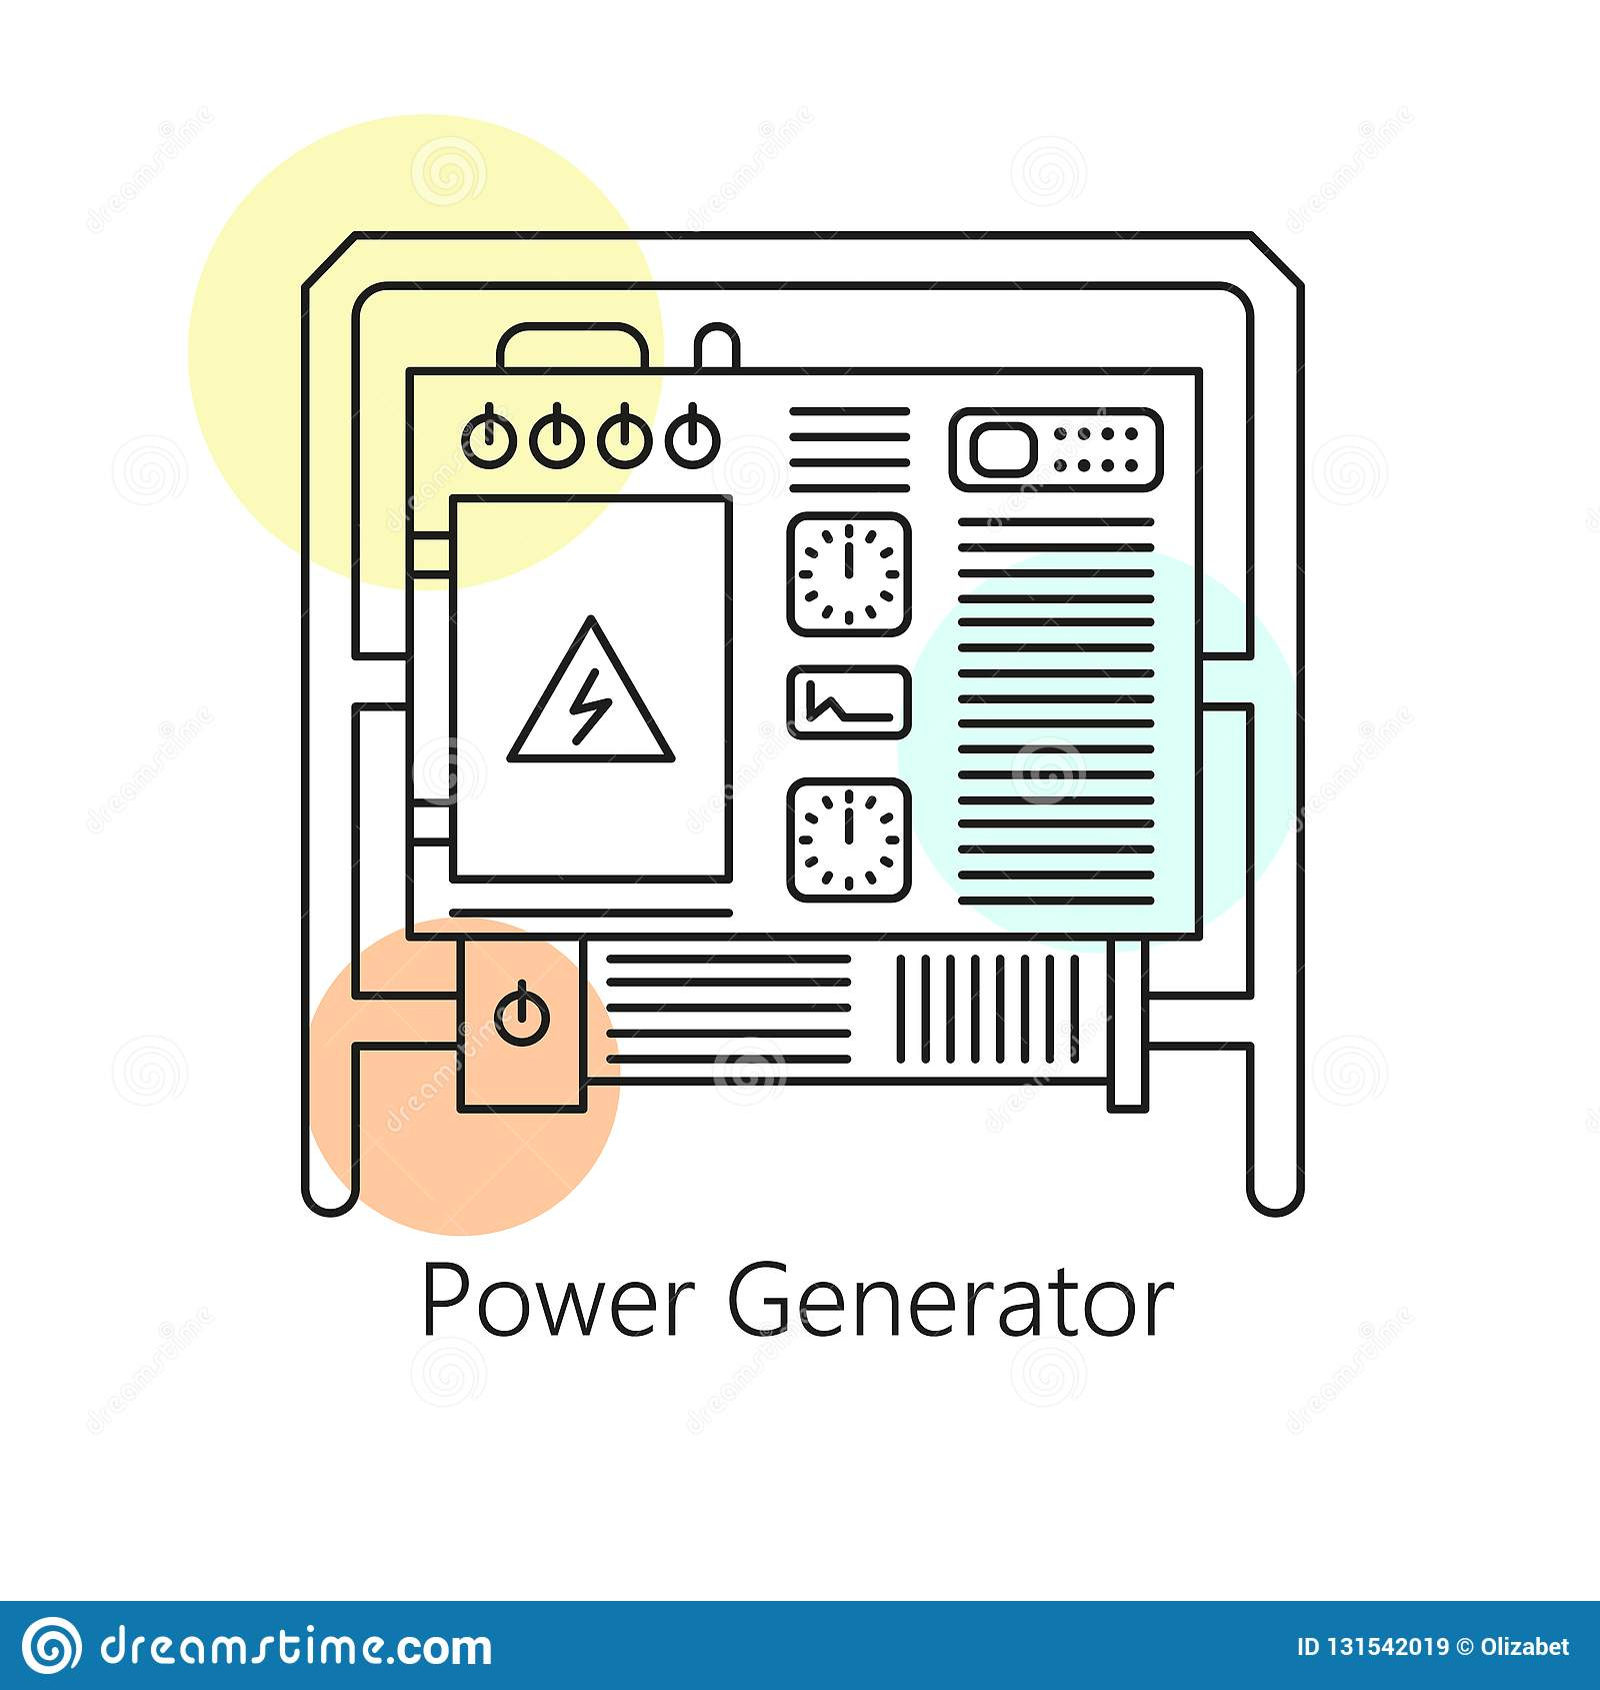 Power generator icon Emergency Power Electric Power Generator Accumulator Thin Line Art Vector Icon Illustration Power Generator Accumulator Thin Line Art Vector Icon Stock Vector